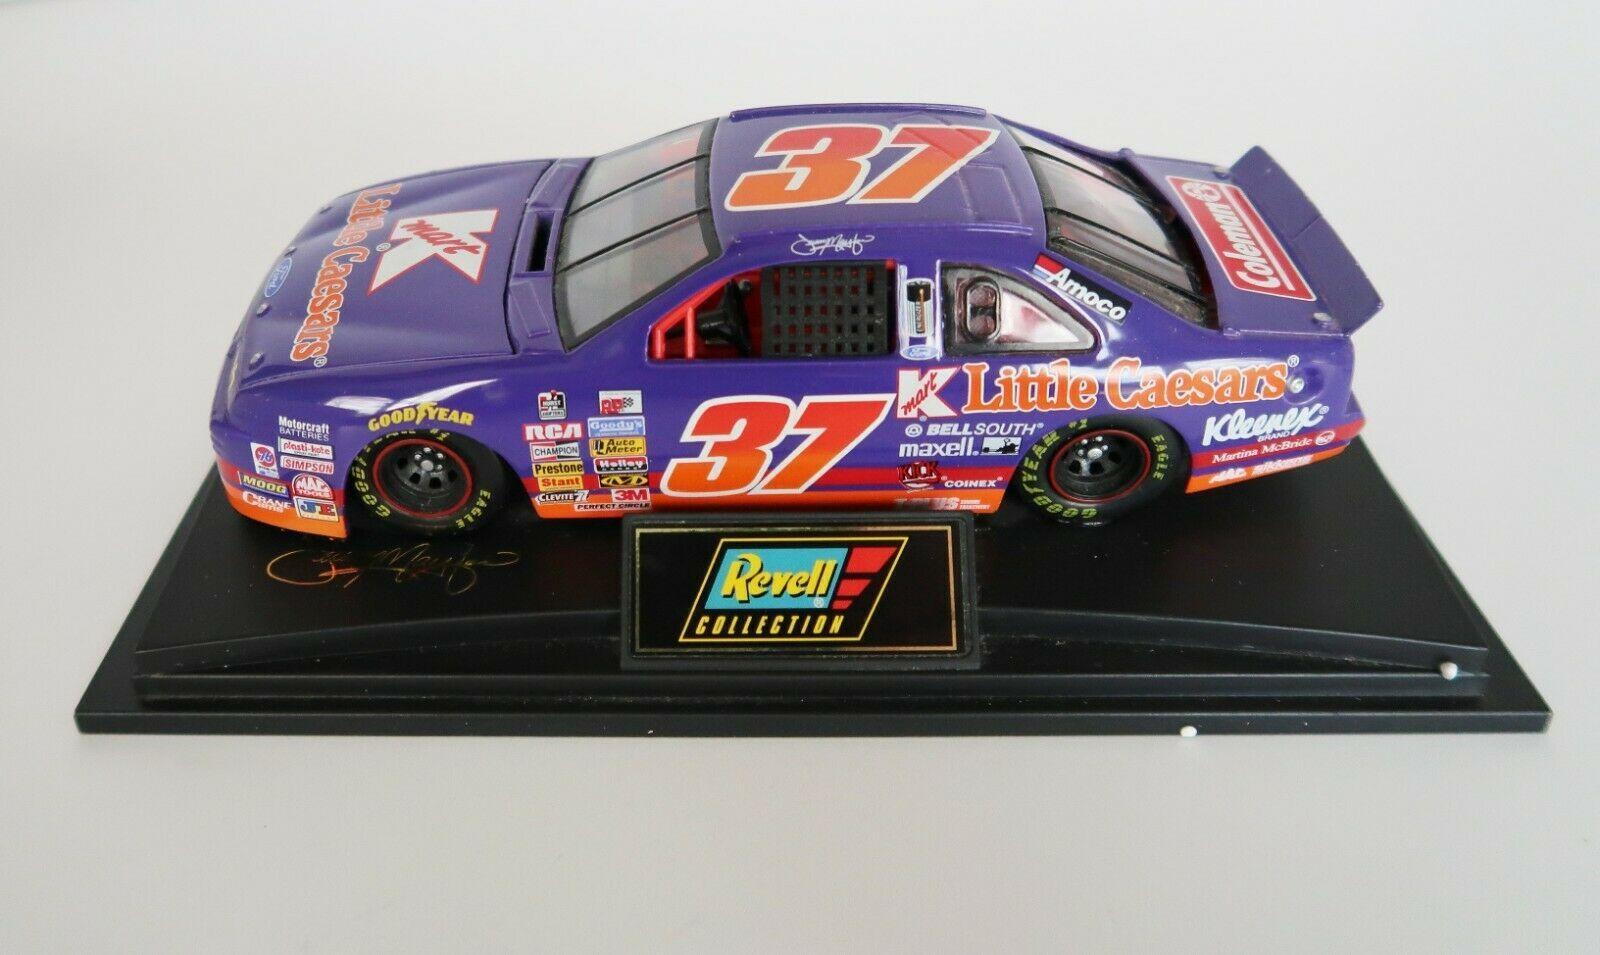 1996 Revell 1:24 NASCAR Jeremy Mayfield K-Mart Little Caesars Ford model car - $29.99